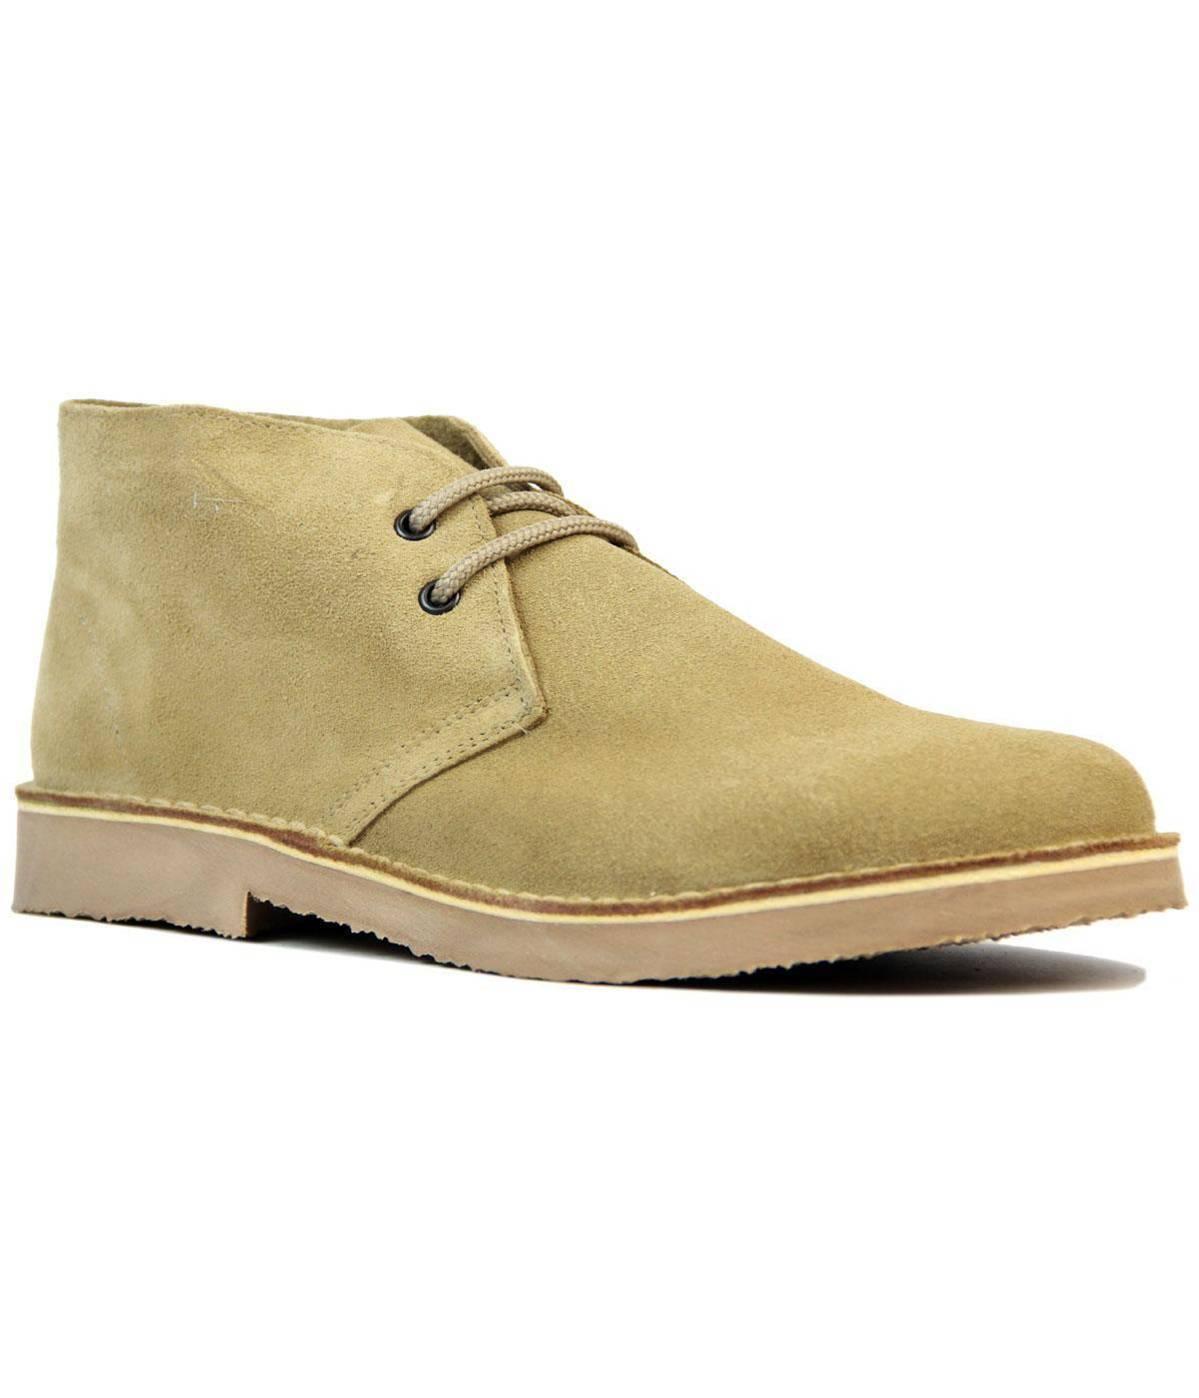 Roamers Desert Men's Comfortable Boots shoes Suede Tan M400TS